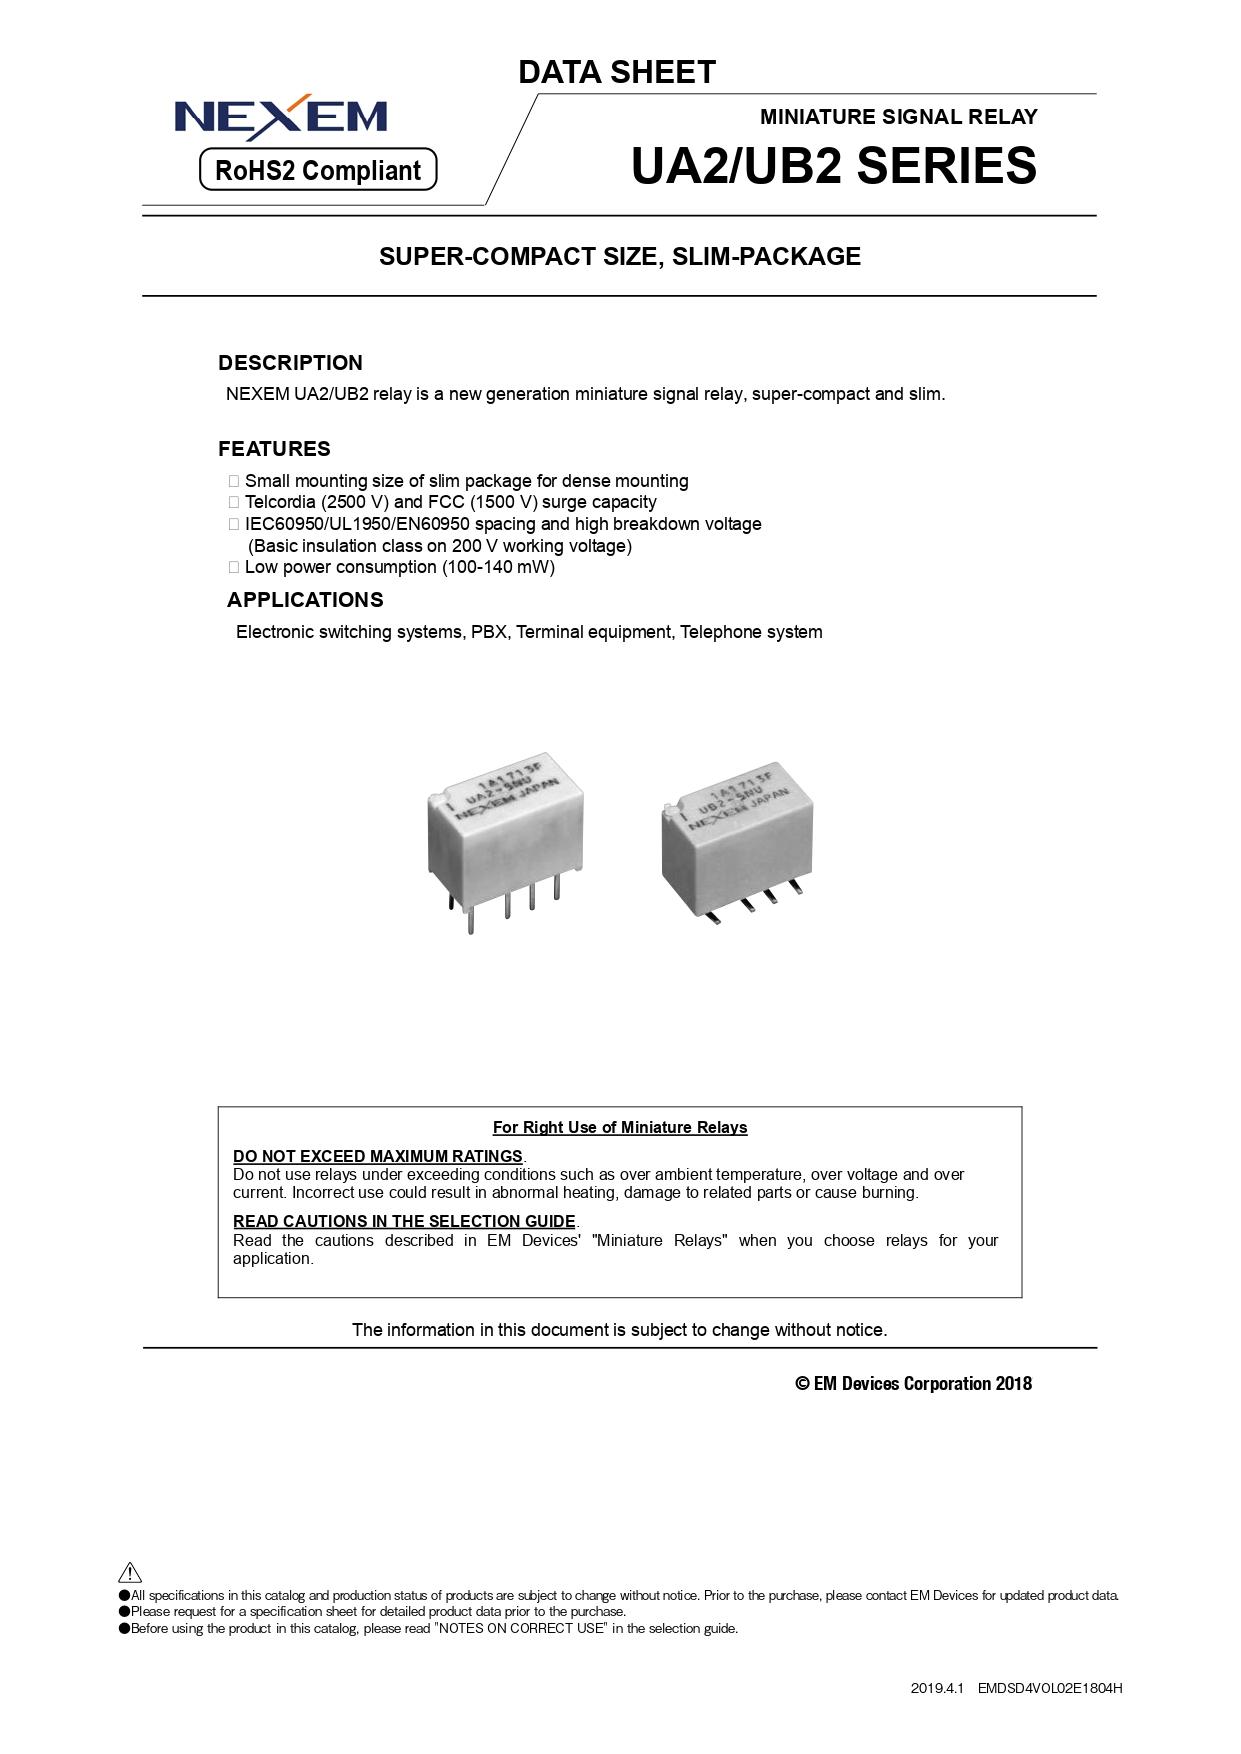 Miniature Signal Relay Data Sheet pdfimage